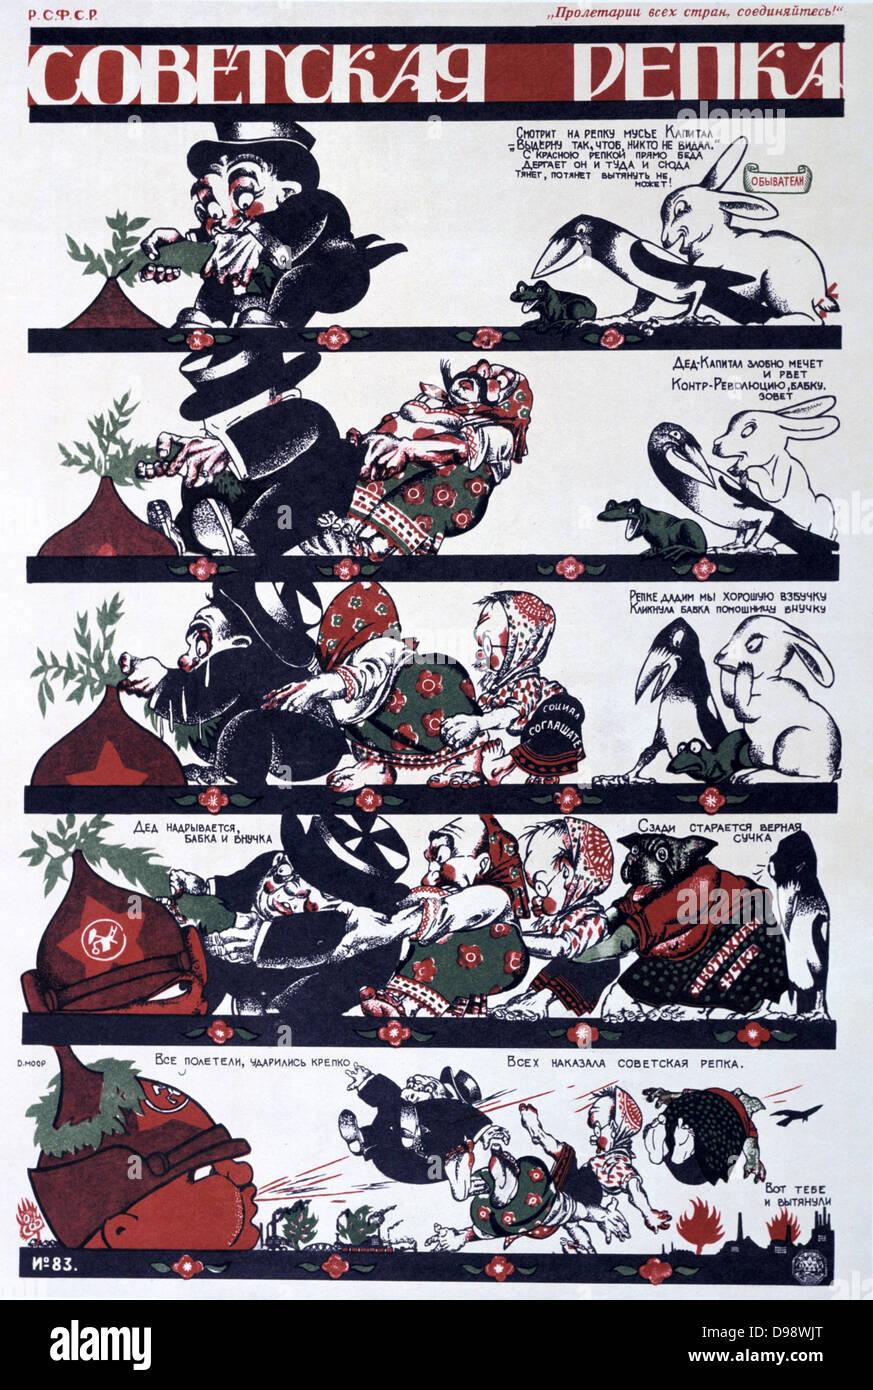 A Soviet Ripka', 1920. Ripka (Turnip) - anti-capitalist allegory on a Russian folk tale. Soviet propaganda poster - Stock Image